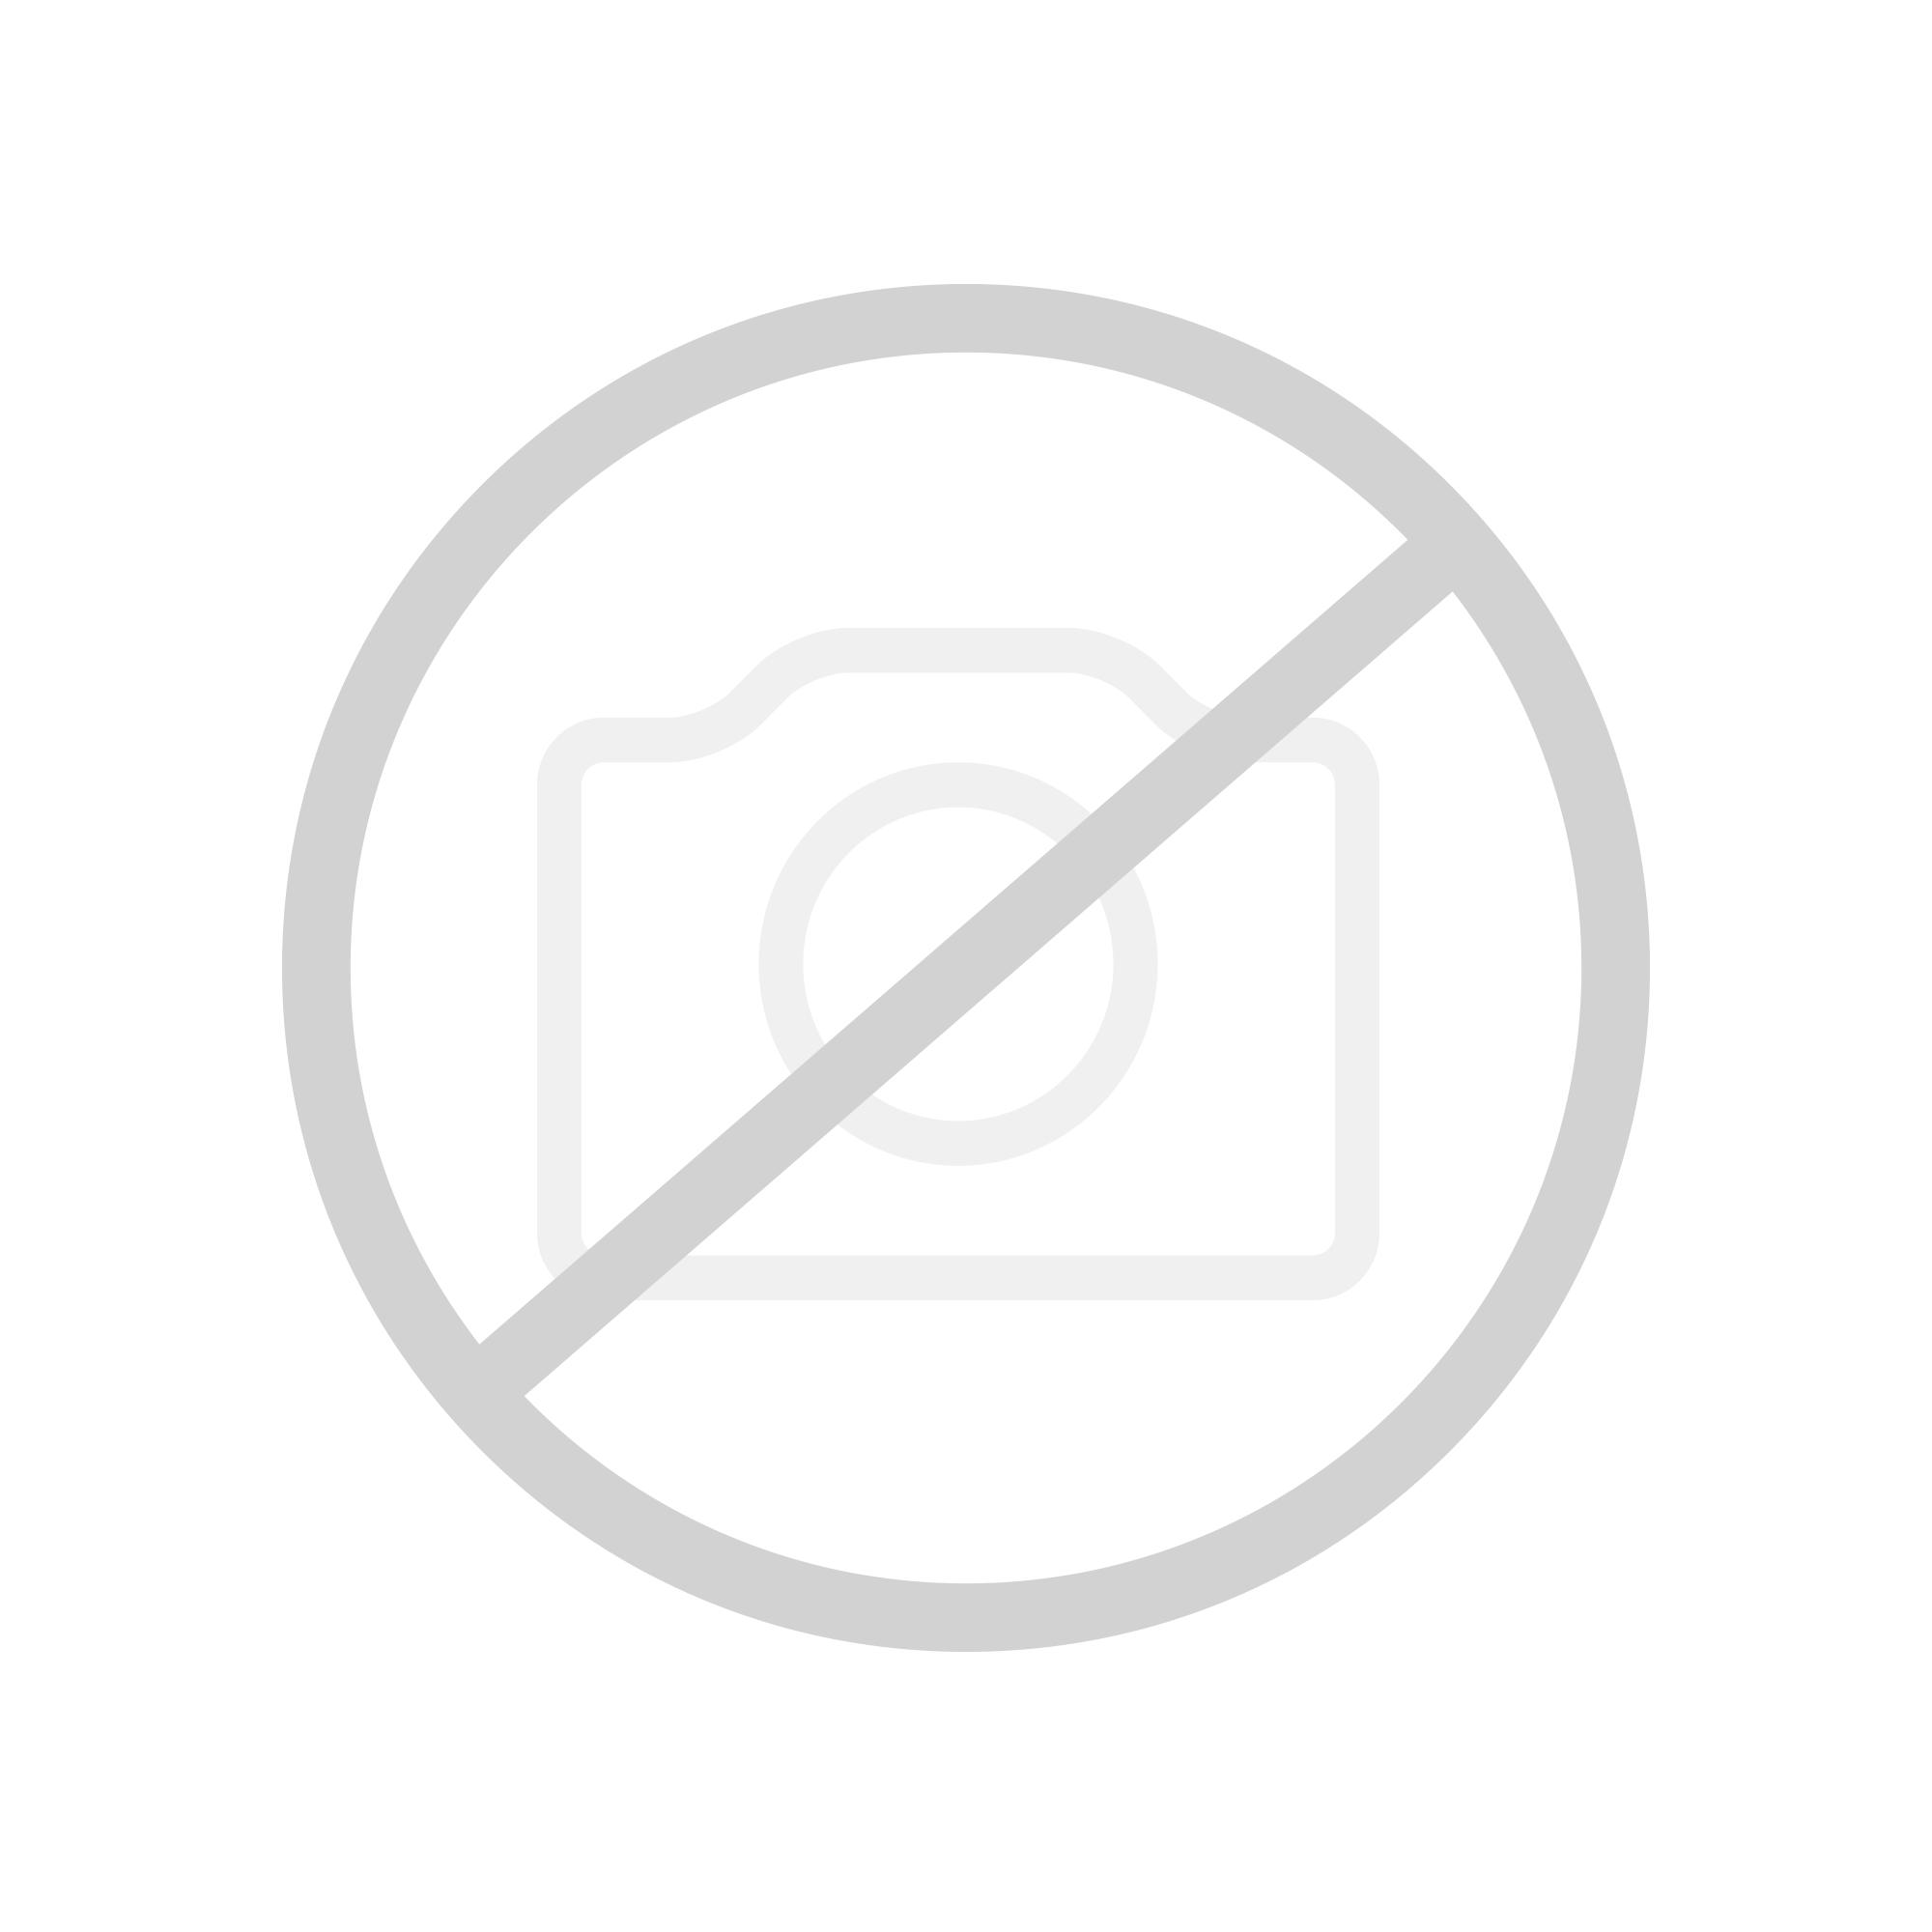 Waschtisch Keramag Renova Nr 1 Plan 60x48cm